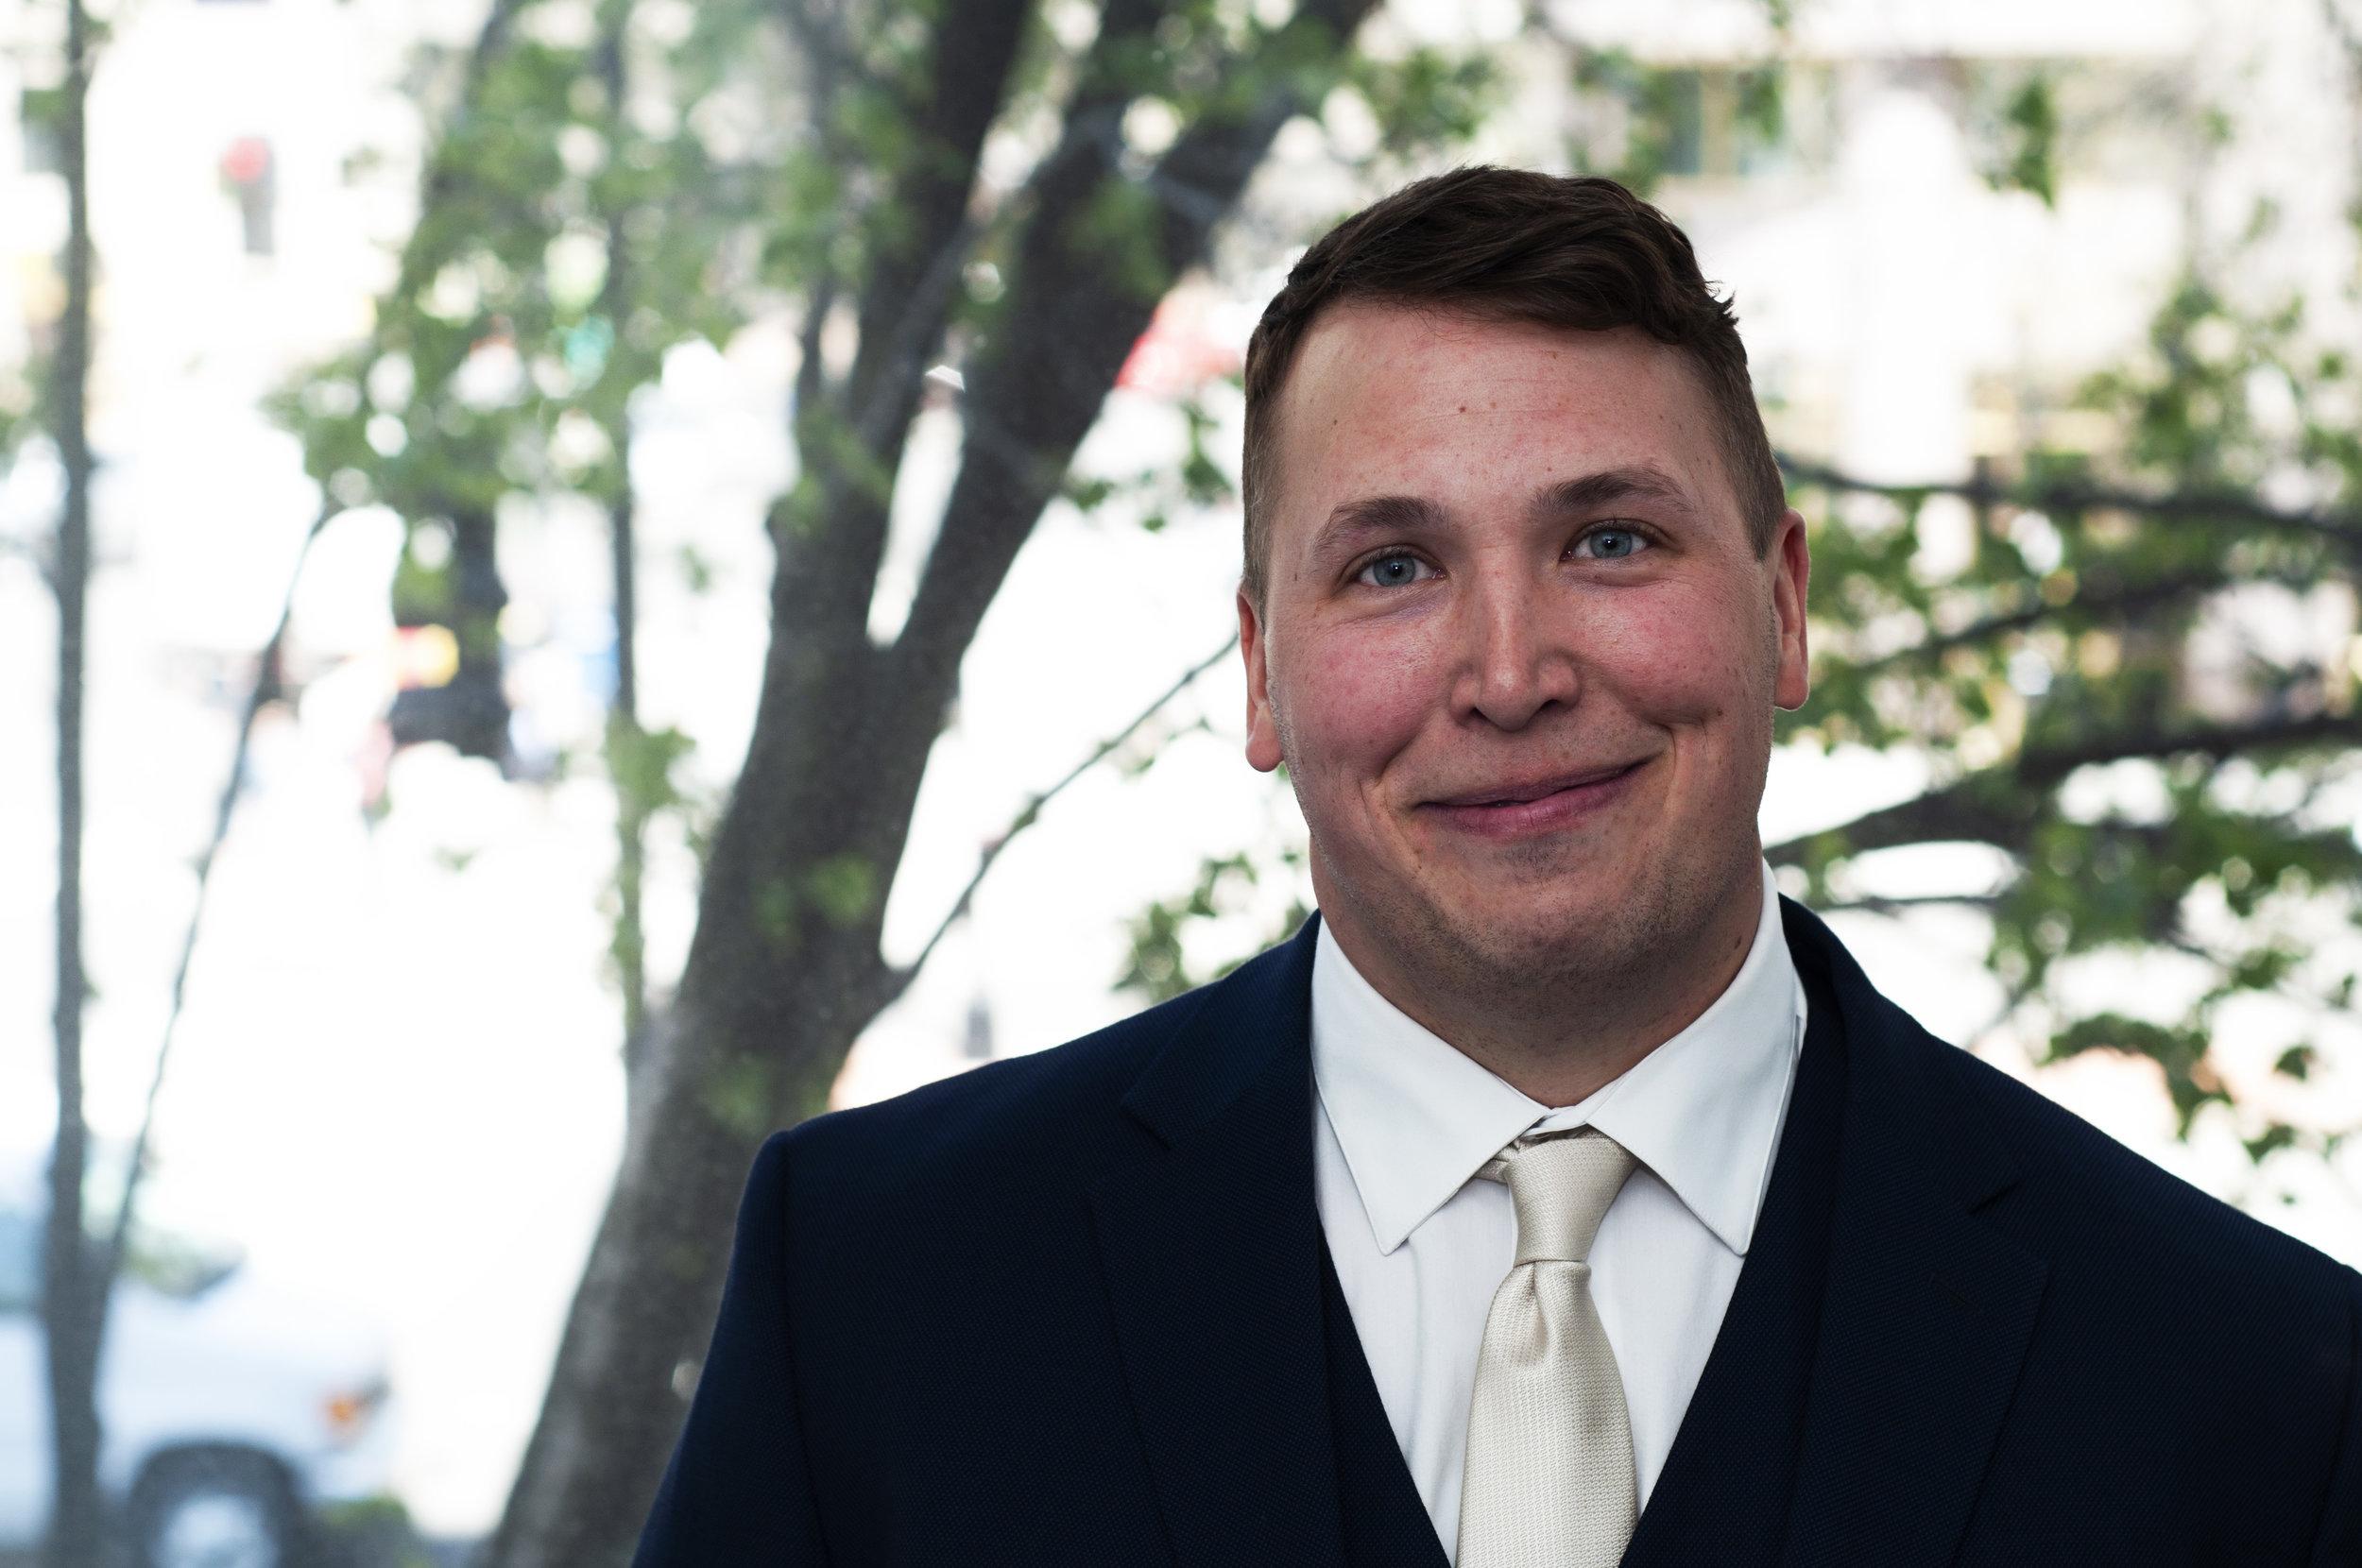 Jake Burk // Senior Project Manager